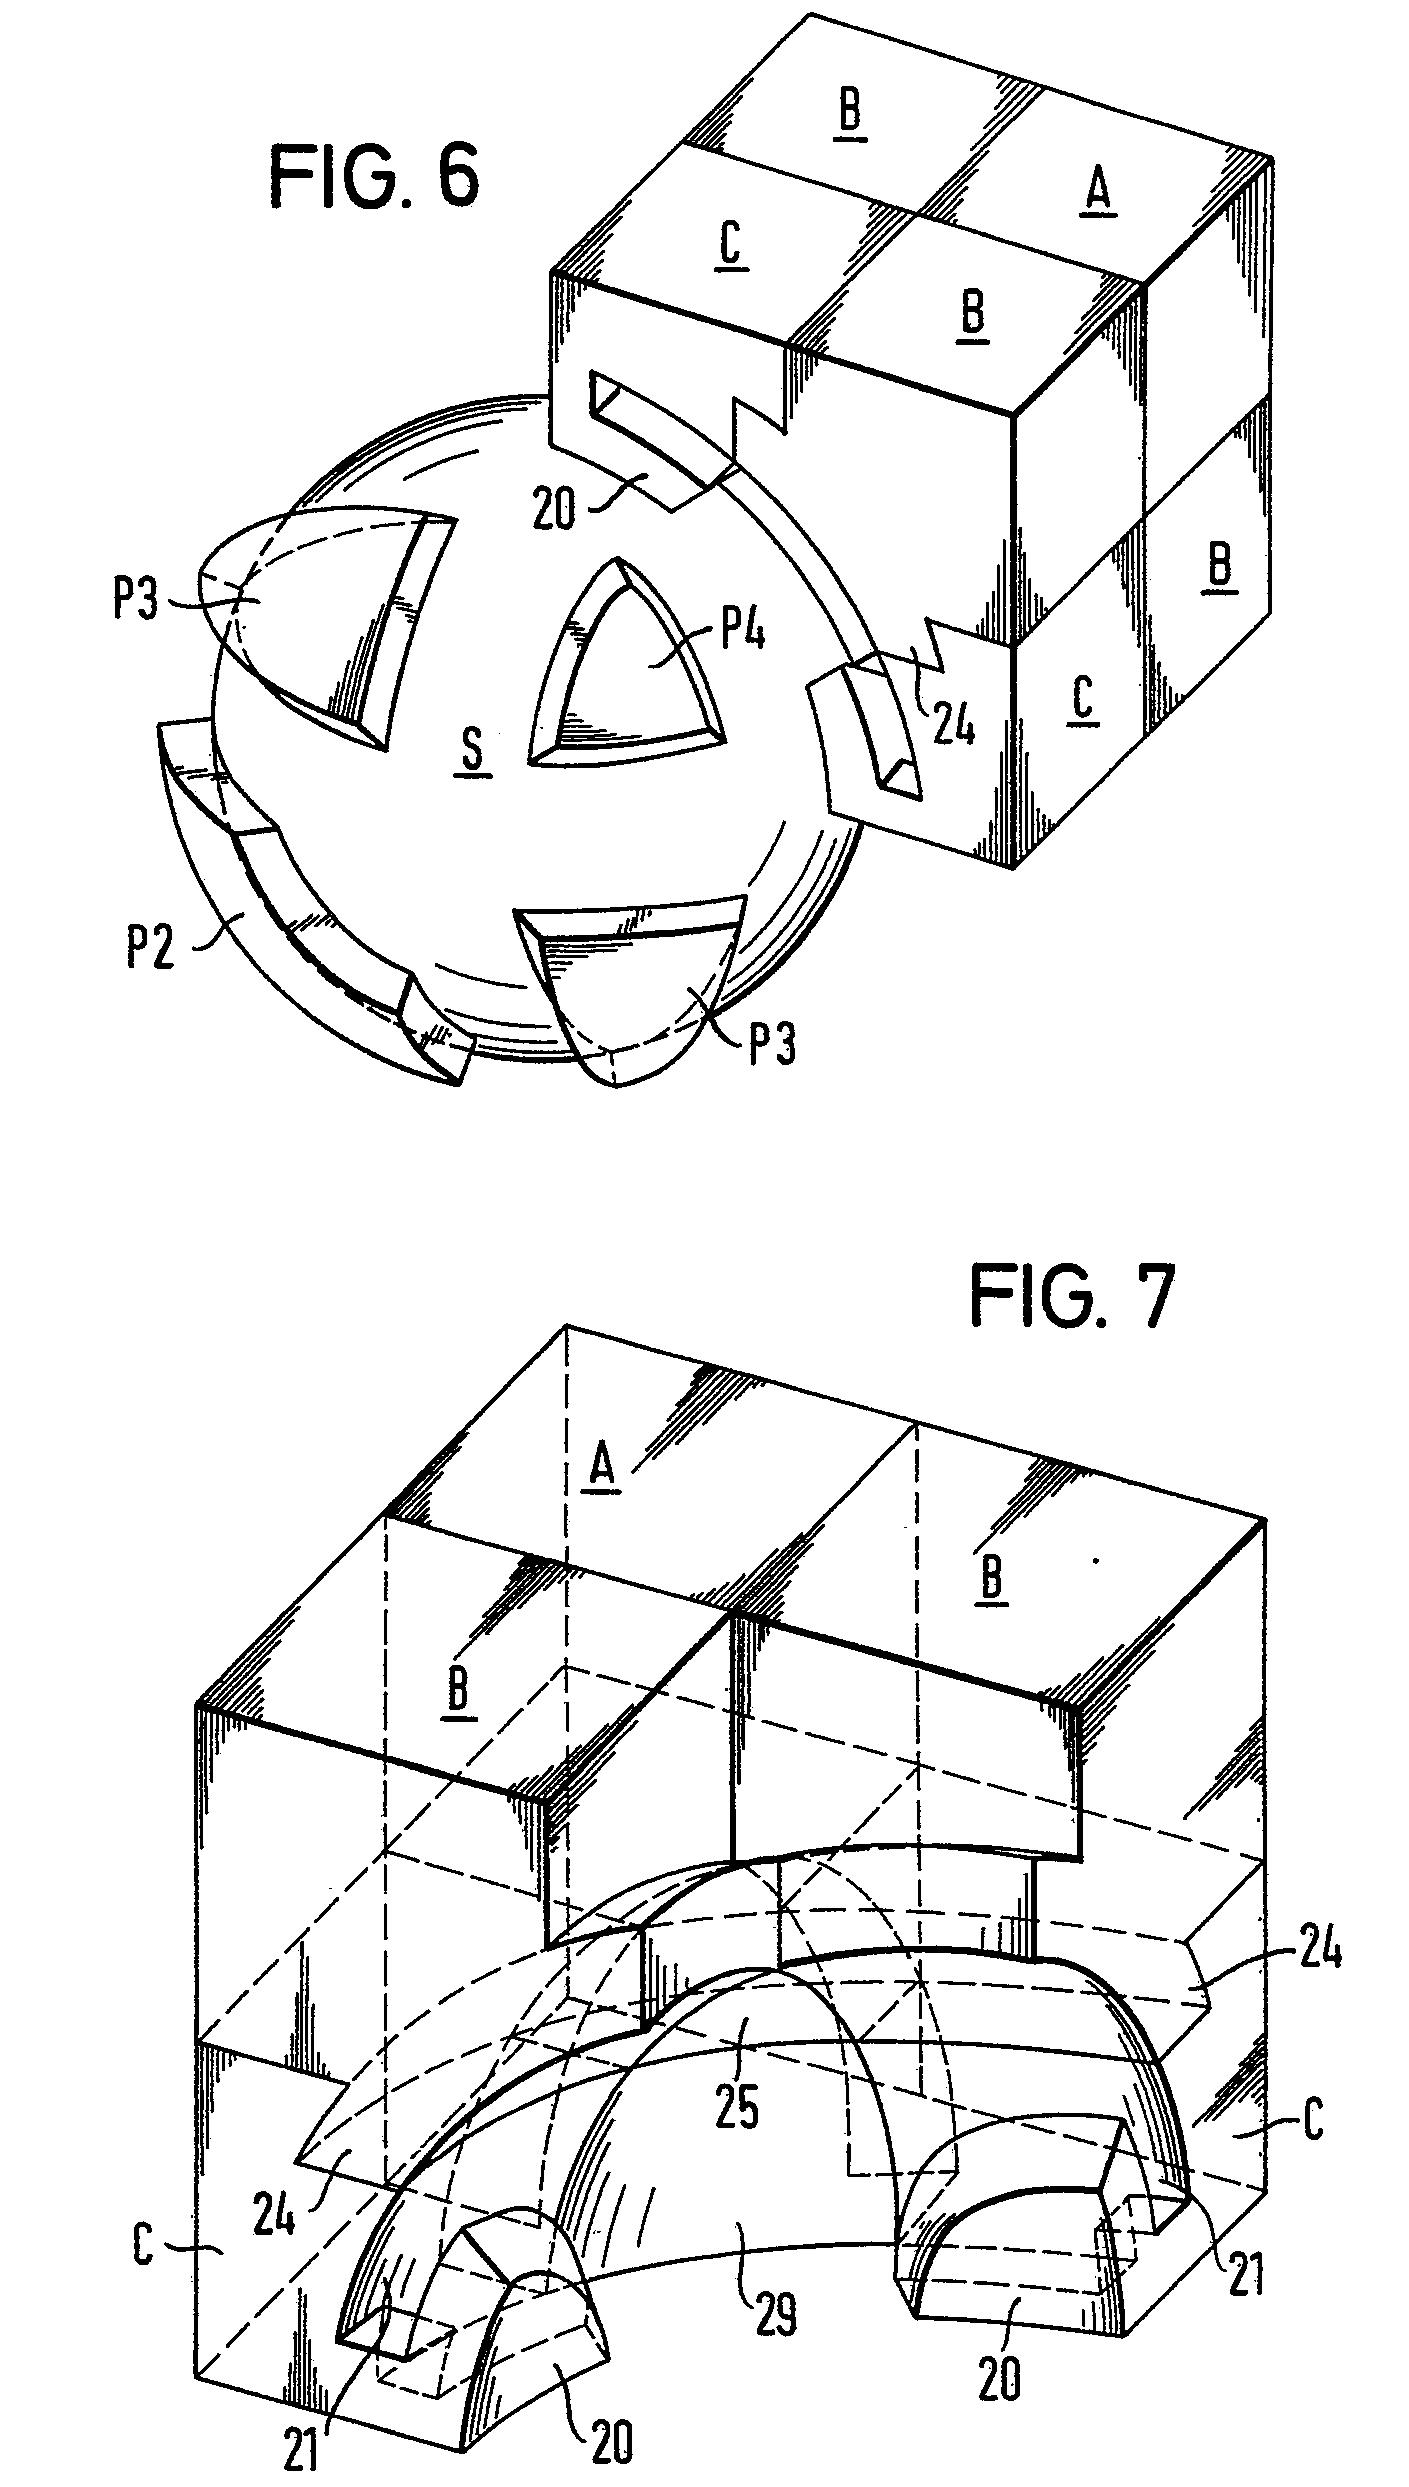 rancangan desain dan mekanisme rubik's 4x4x4 revenge